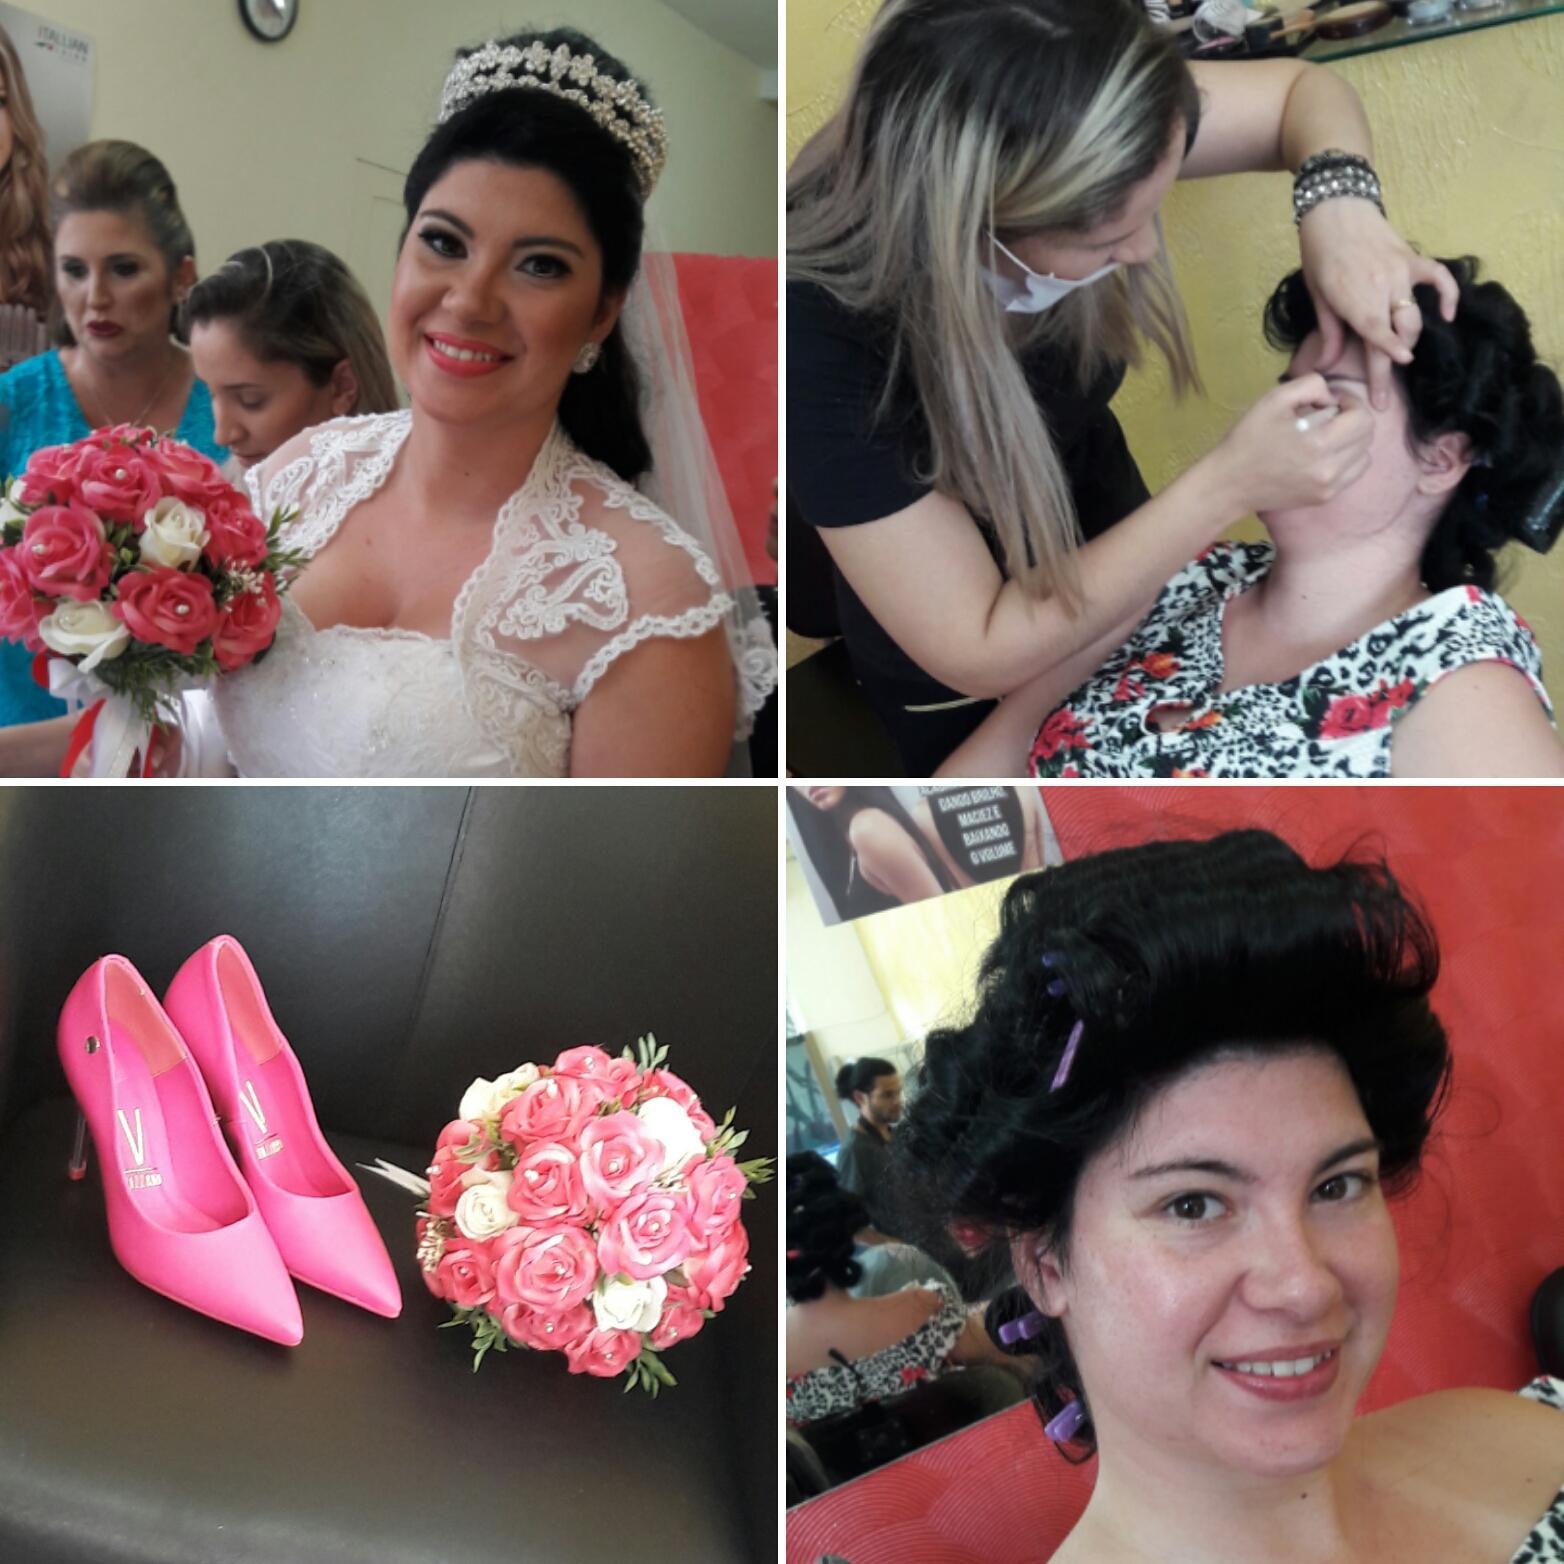 Penteado dia da noiva. #diadanoiva #penteado #hairstylist #haircut #hairdresser #hairdo #beauty #beleza @blessed.patty  cabelo cabeleireiro(a)